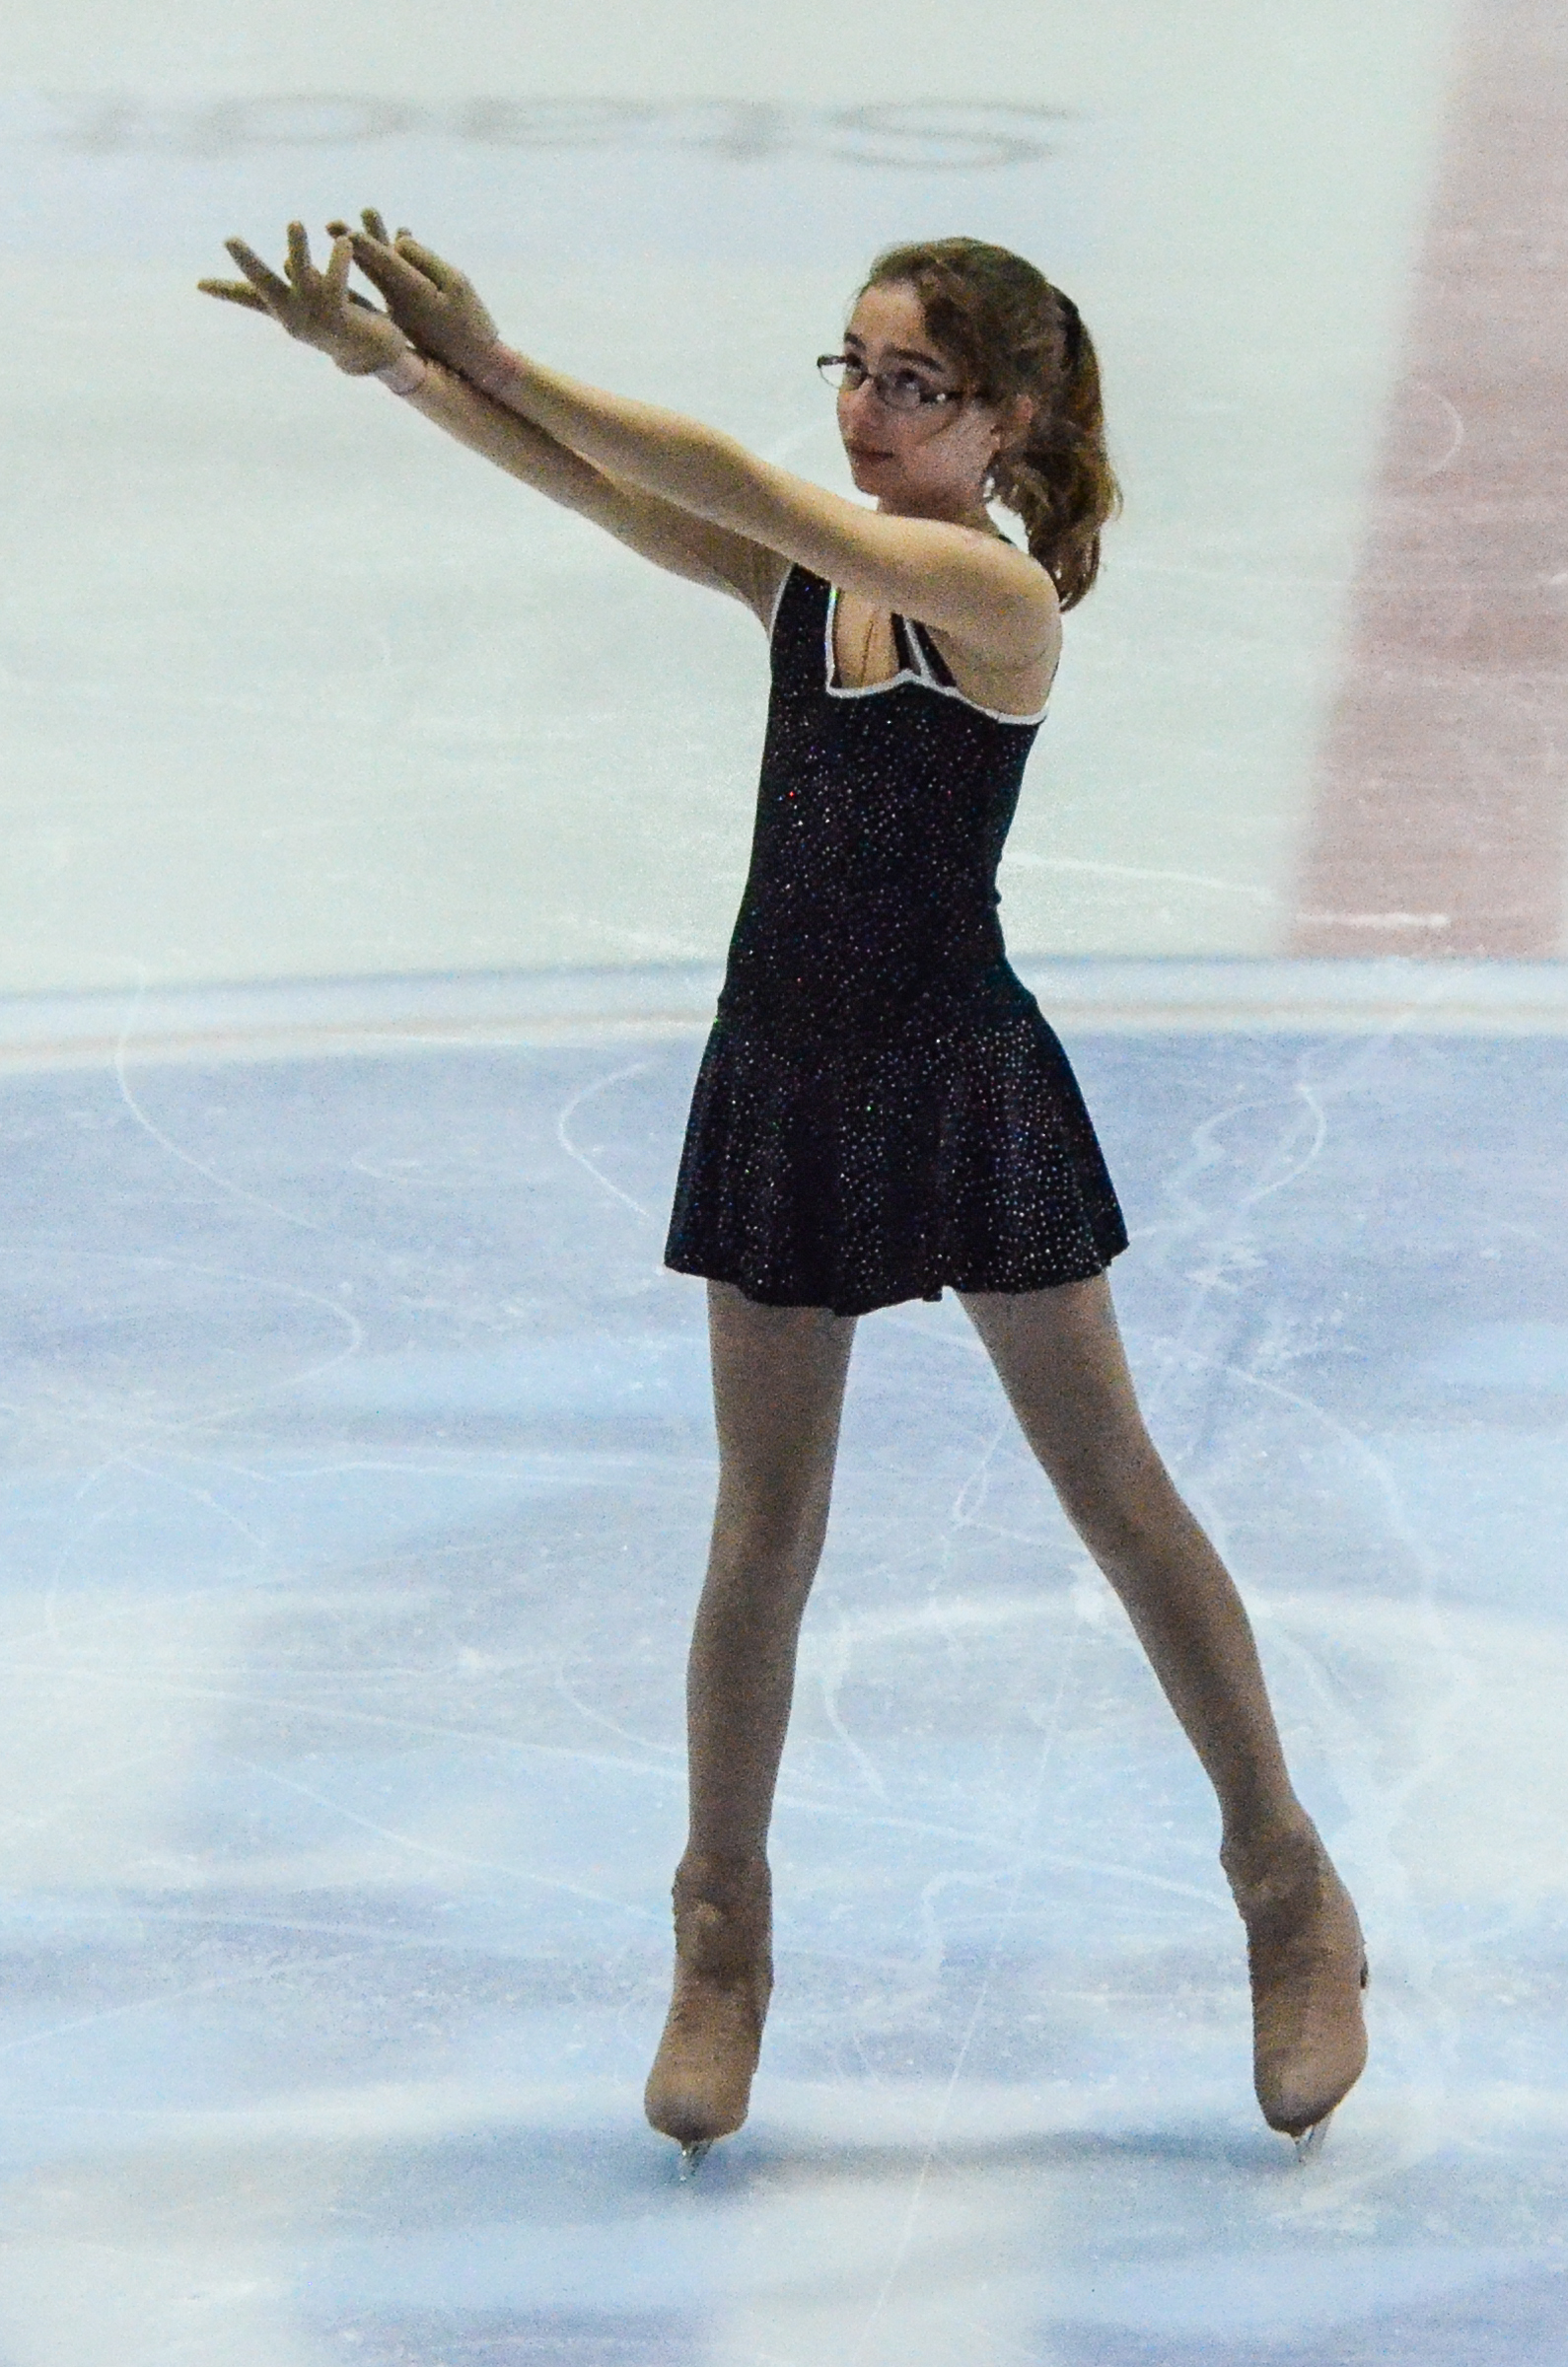 Milena Imholz